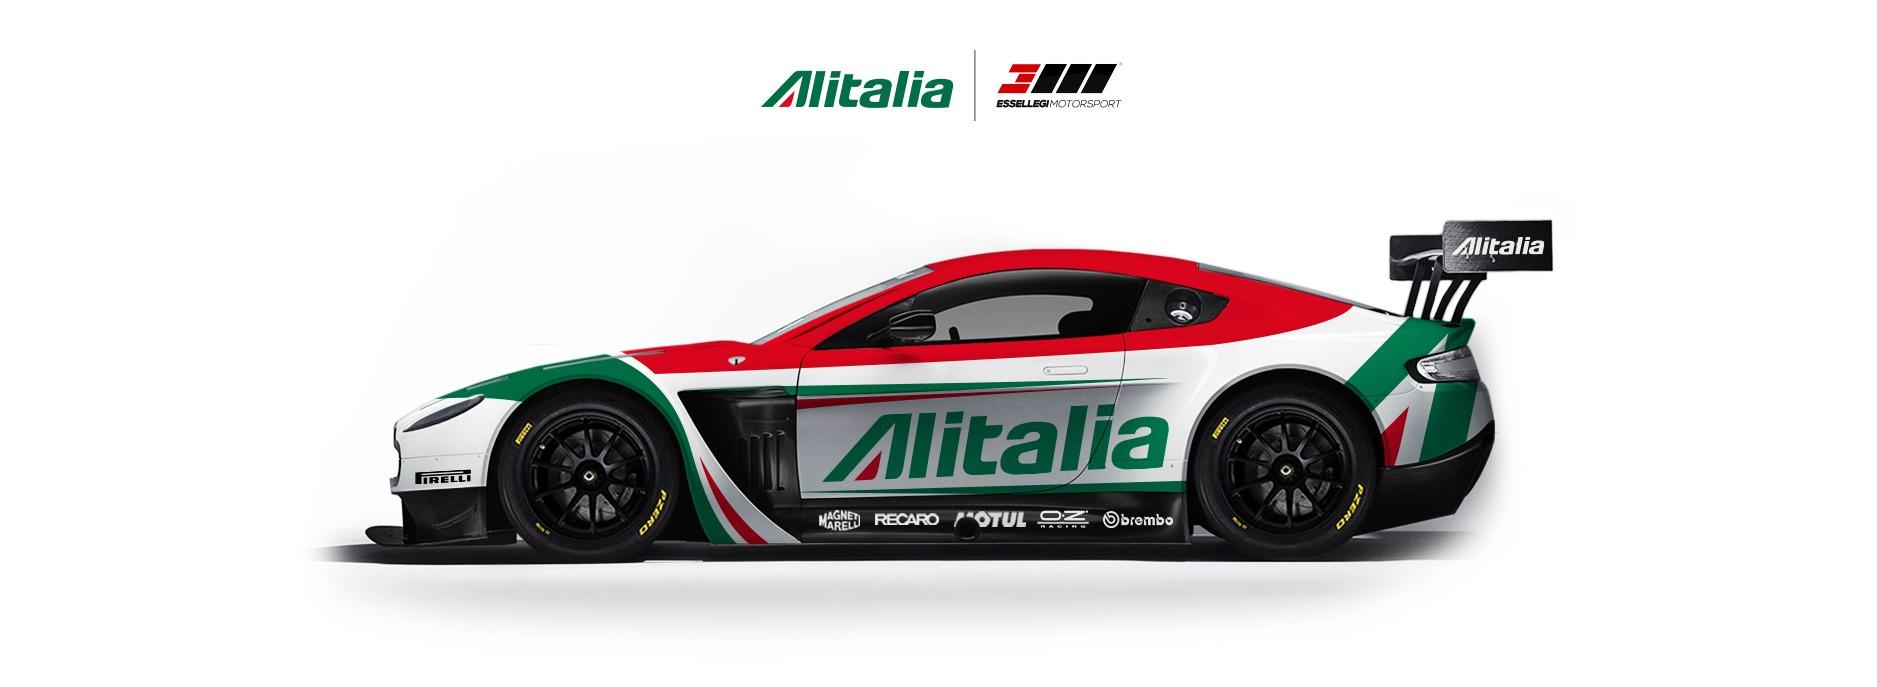 Mazda 3 2017 Custom >> Martini, Alitalia & Castrol Racing Decals | Custom Hotwheels & Model Cars